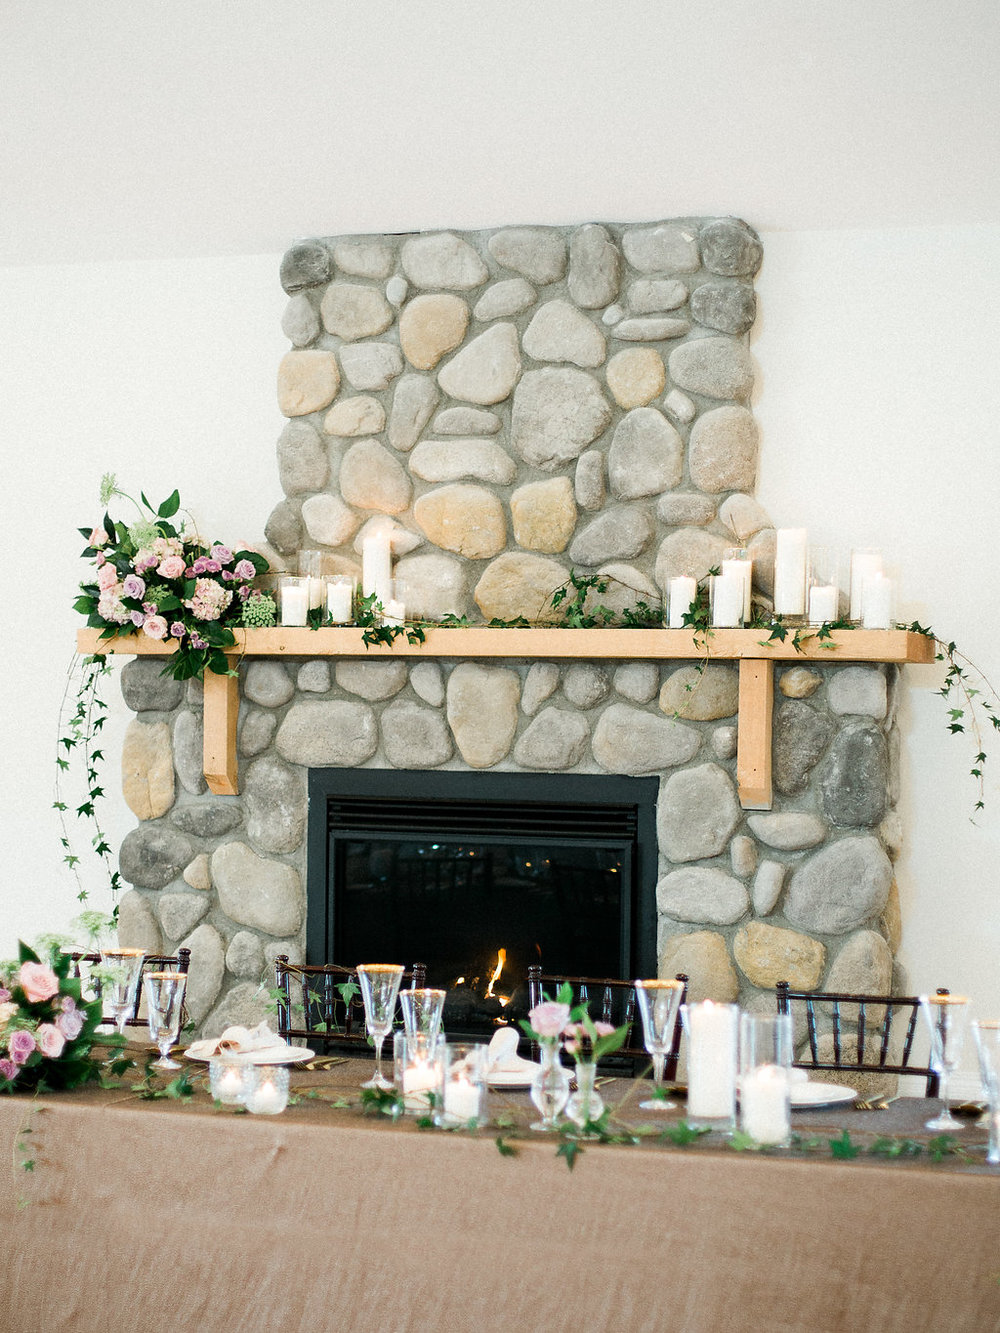 Whitetail Meadow Weddings - Wedding Flowers Winnipeg